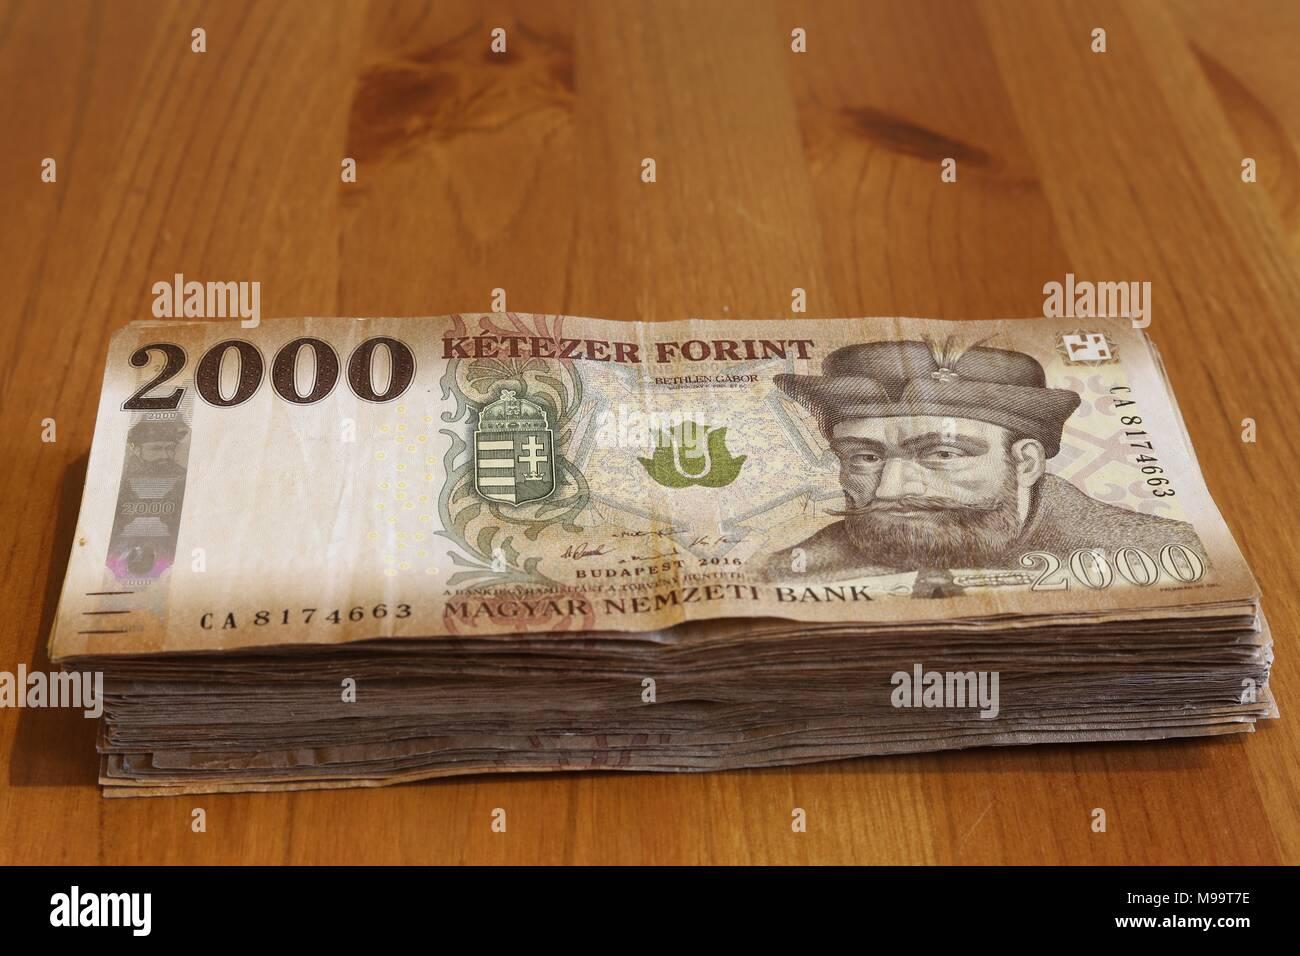 The Forint Stockfotos & The Forint Bilder - Seite 2 - Alamy